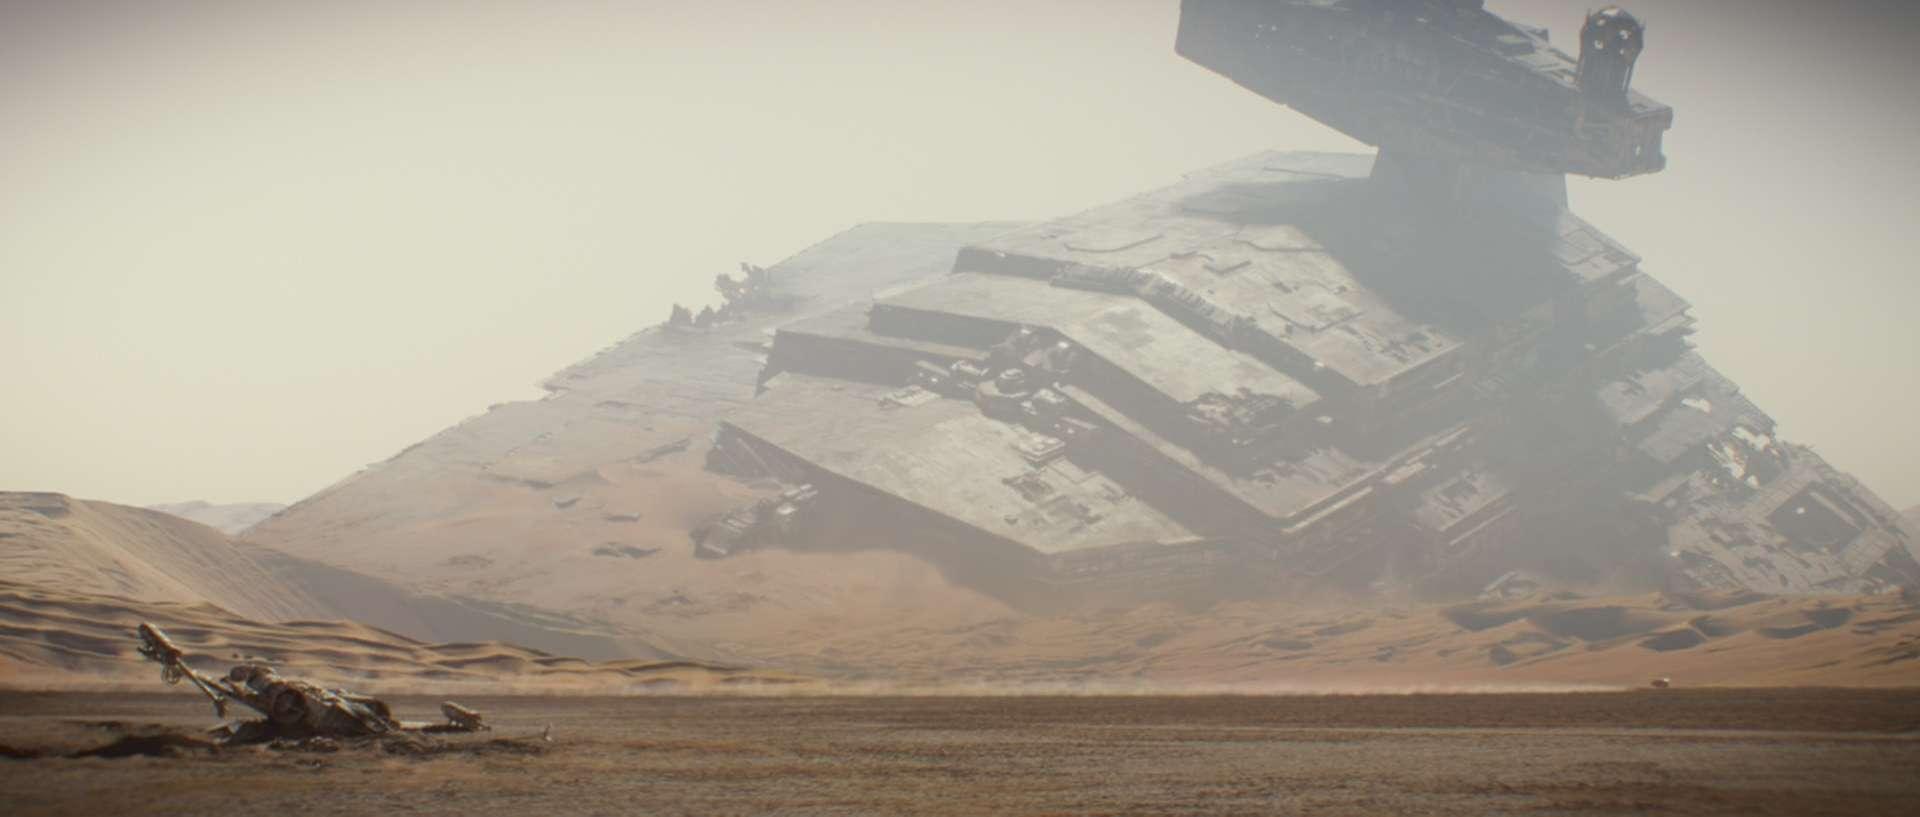 Star Wars Episode VII The Force Awakens Wallpaper 014